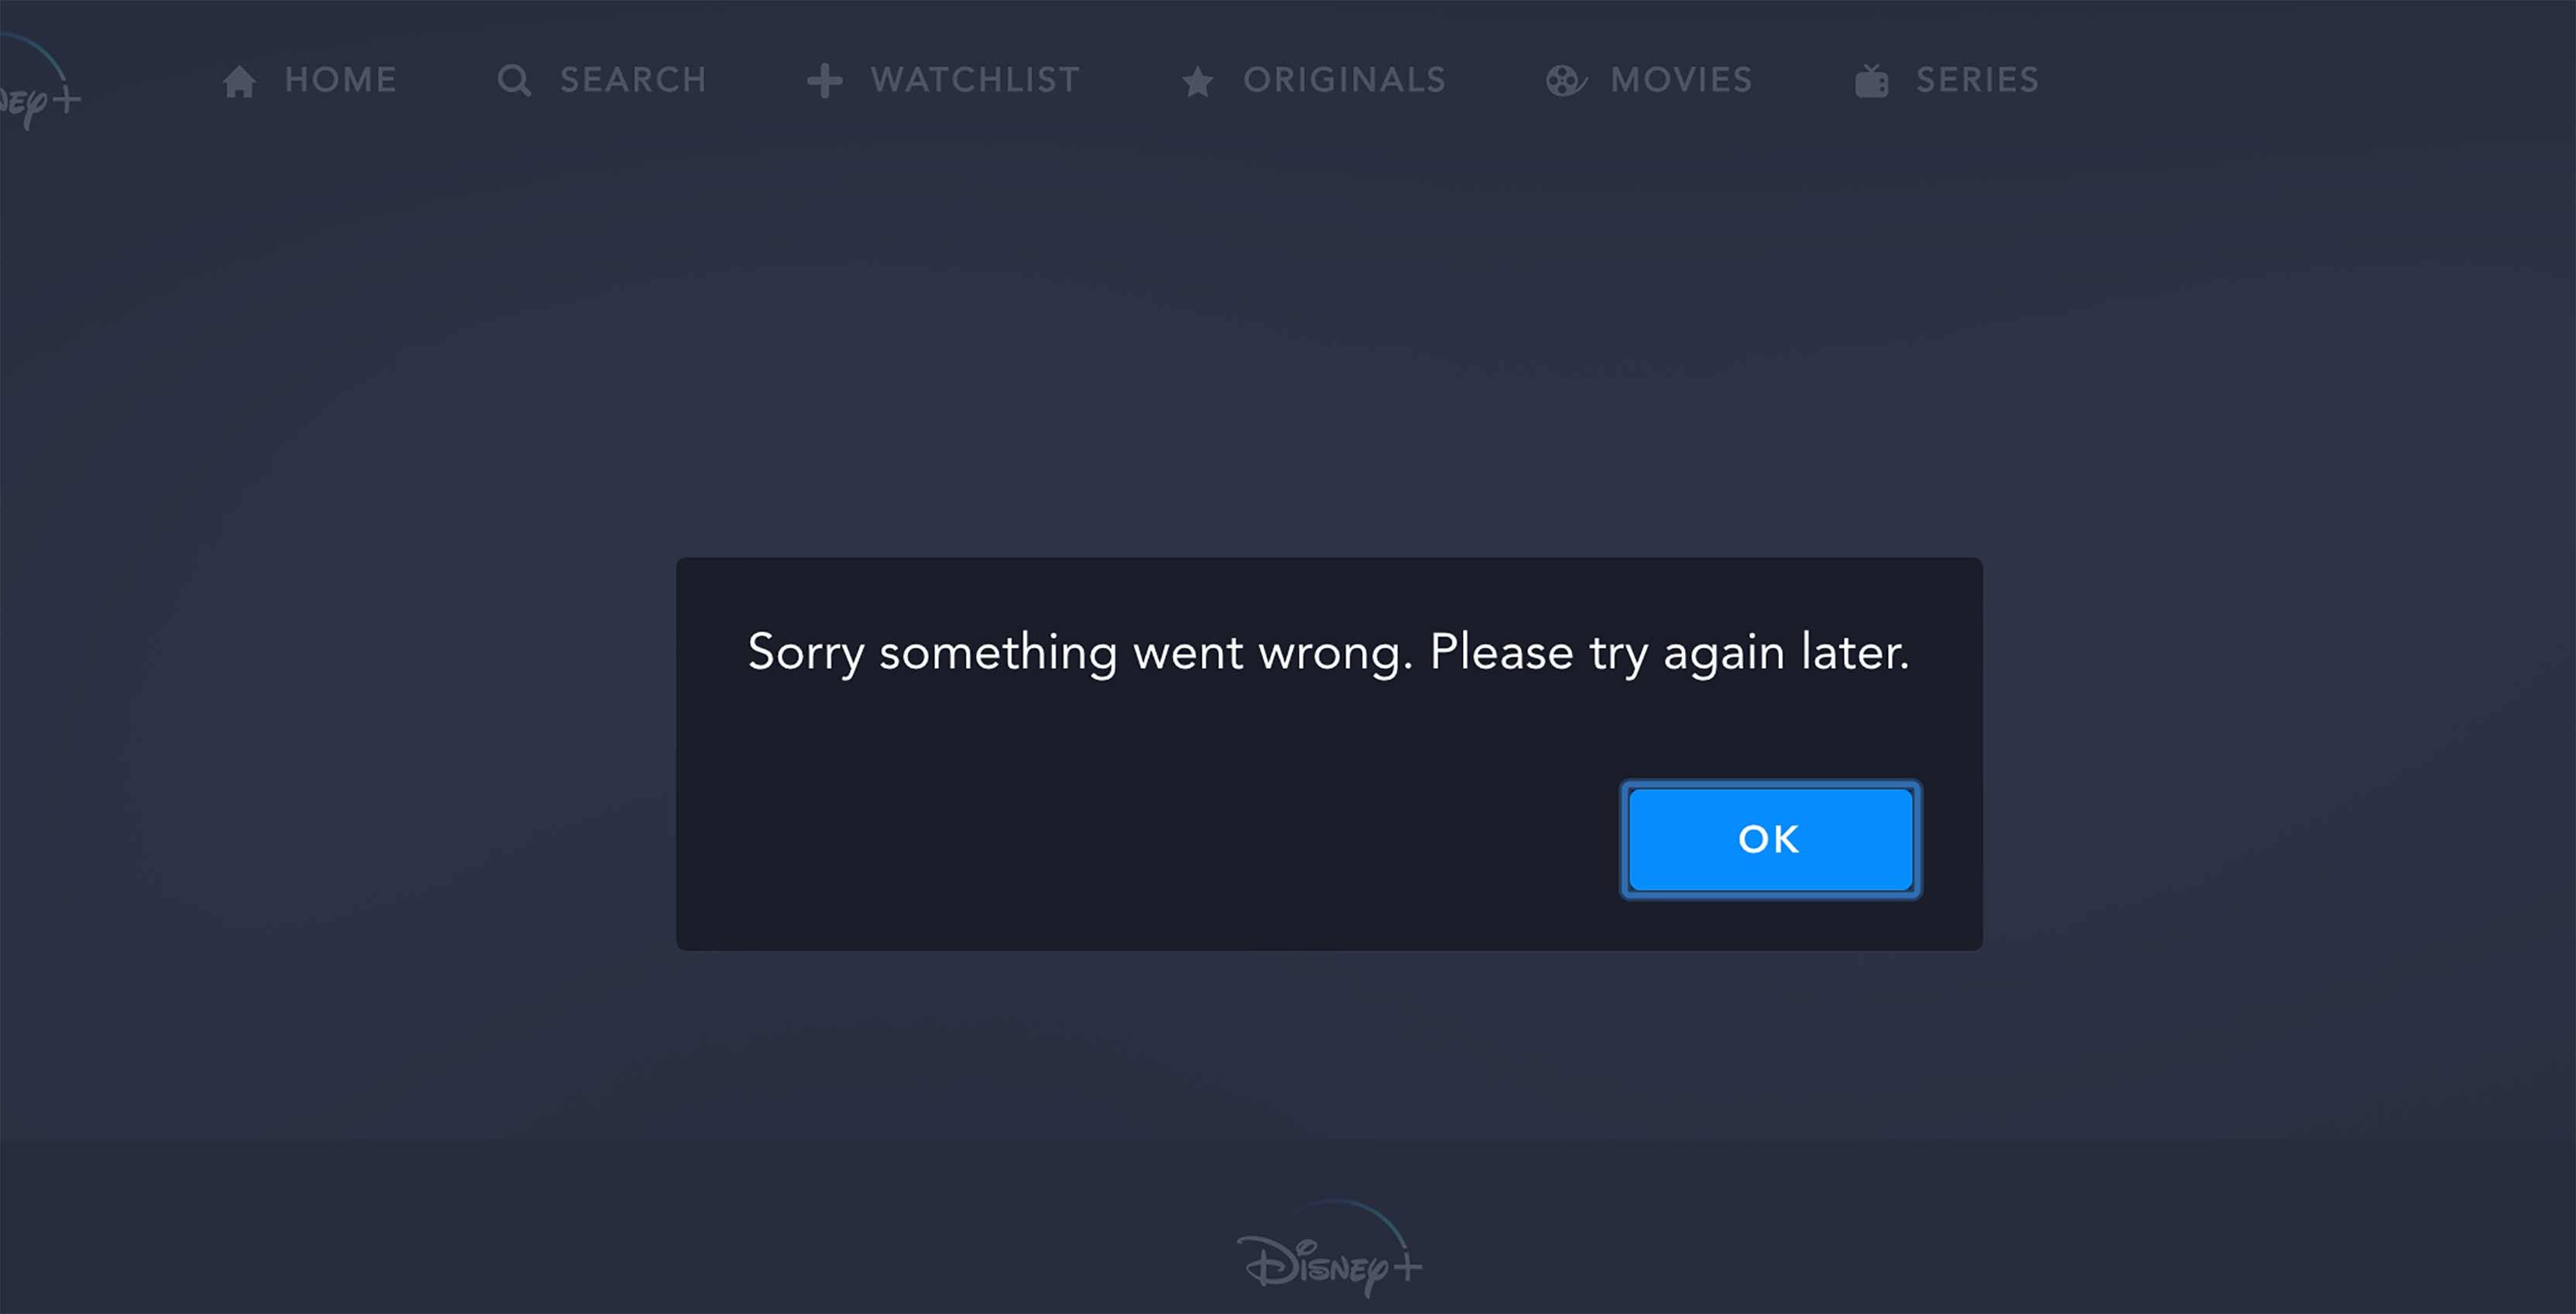 Disney+ error